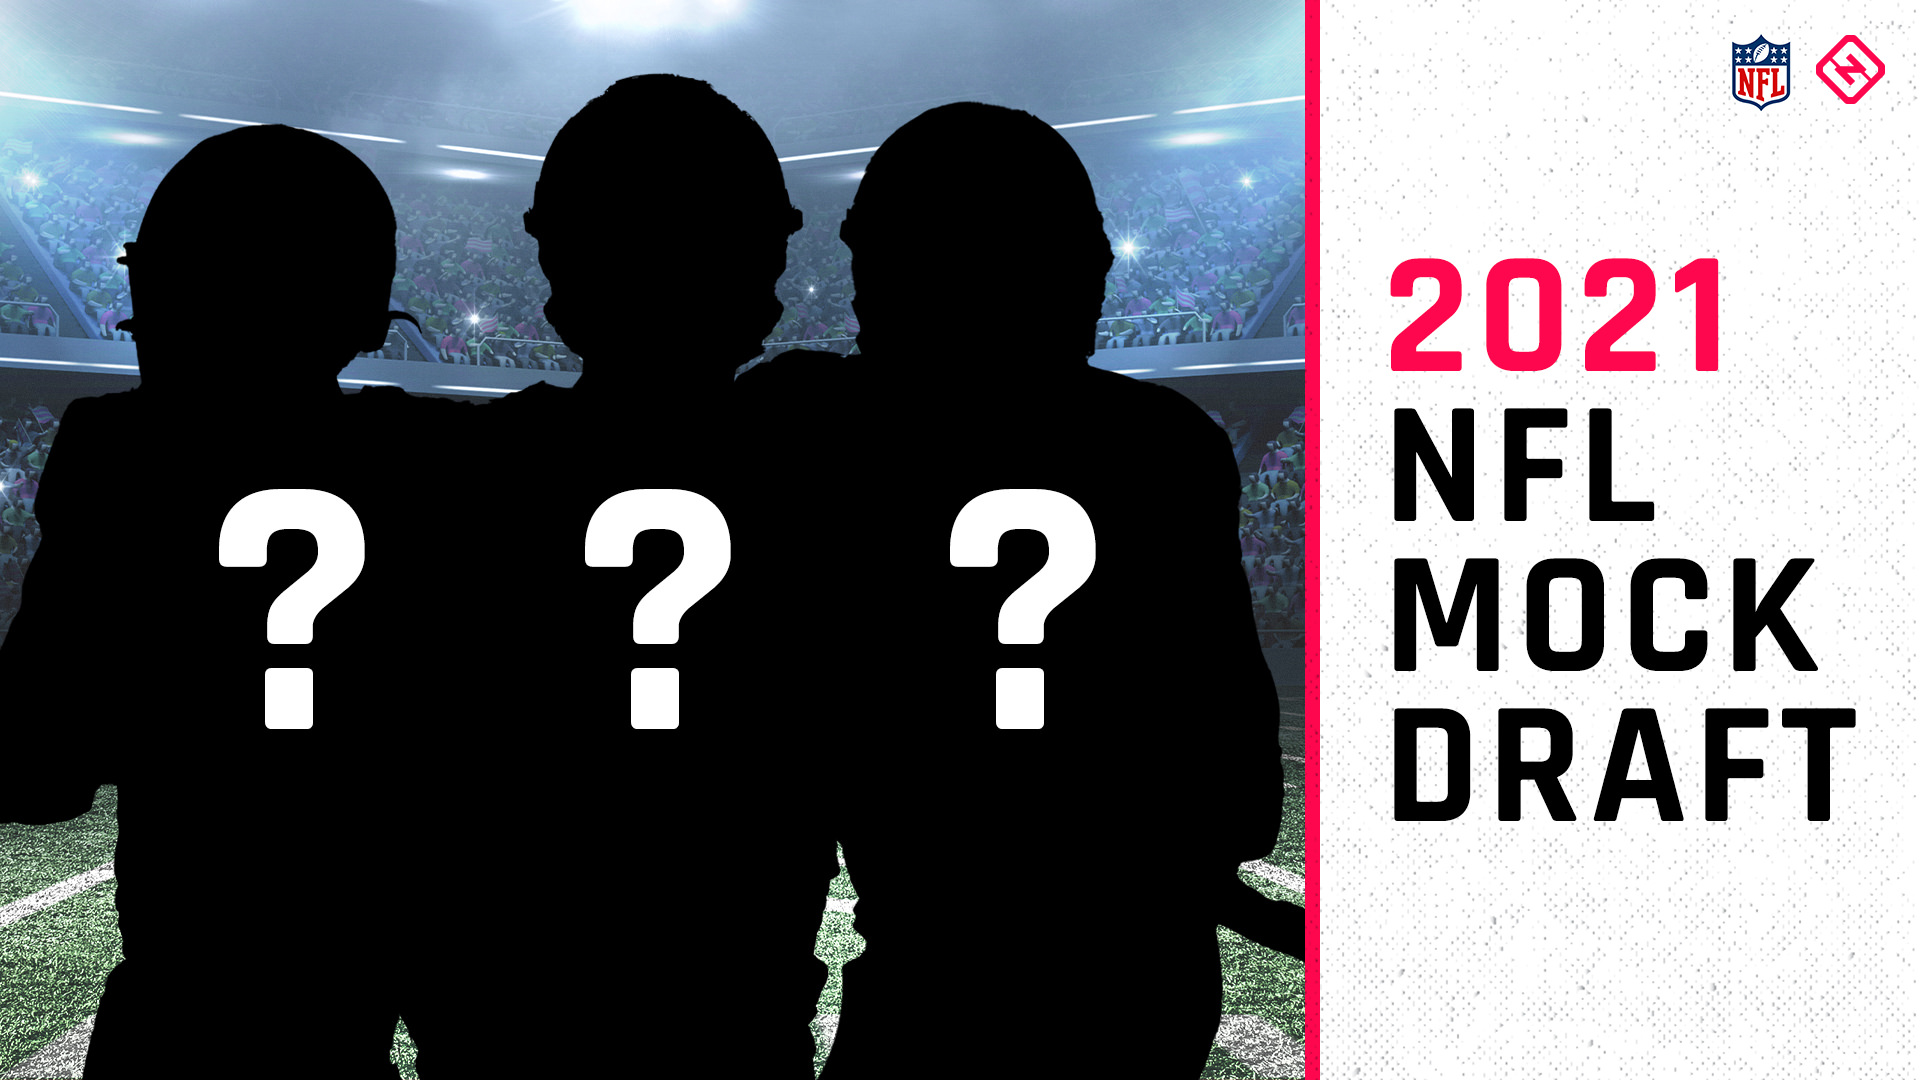 NFL mock draft 2021: Falcons perdem Justin Fields;  Panteras pousam no topo do TE;  Packers, Lions, Bears vão WR